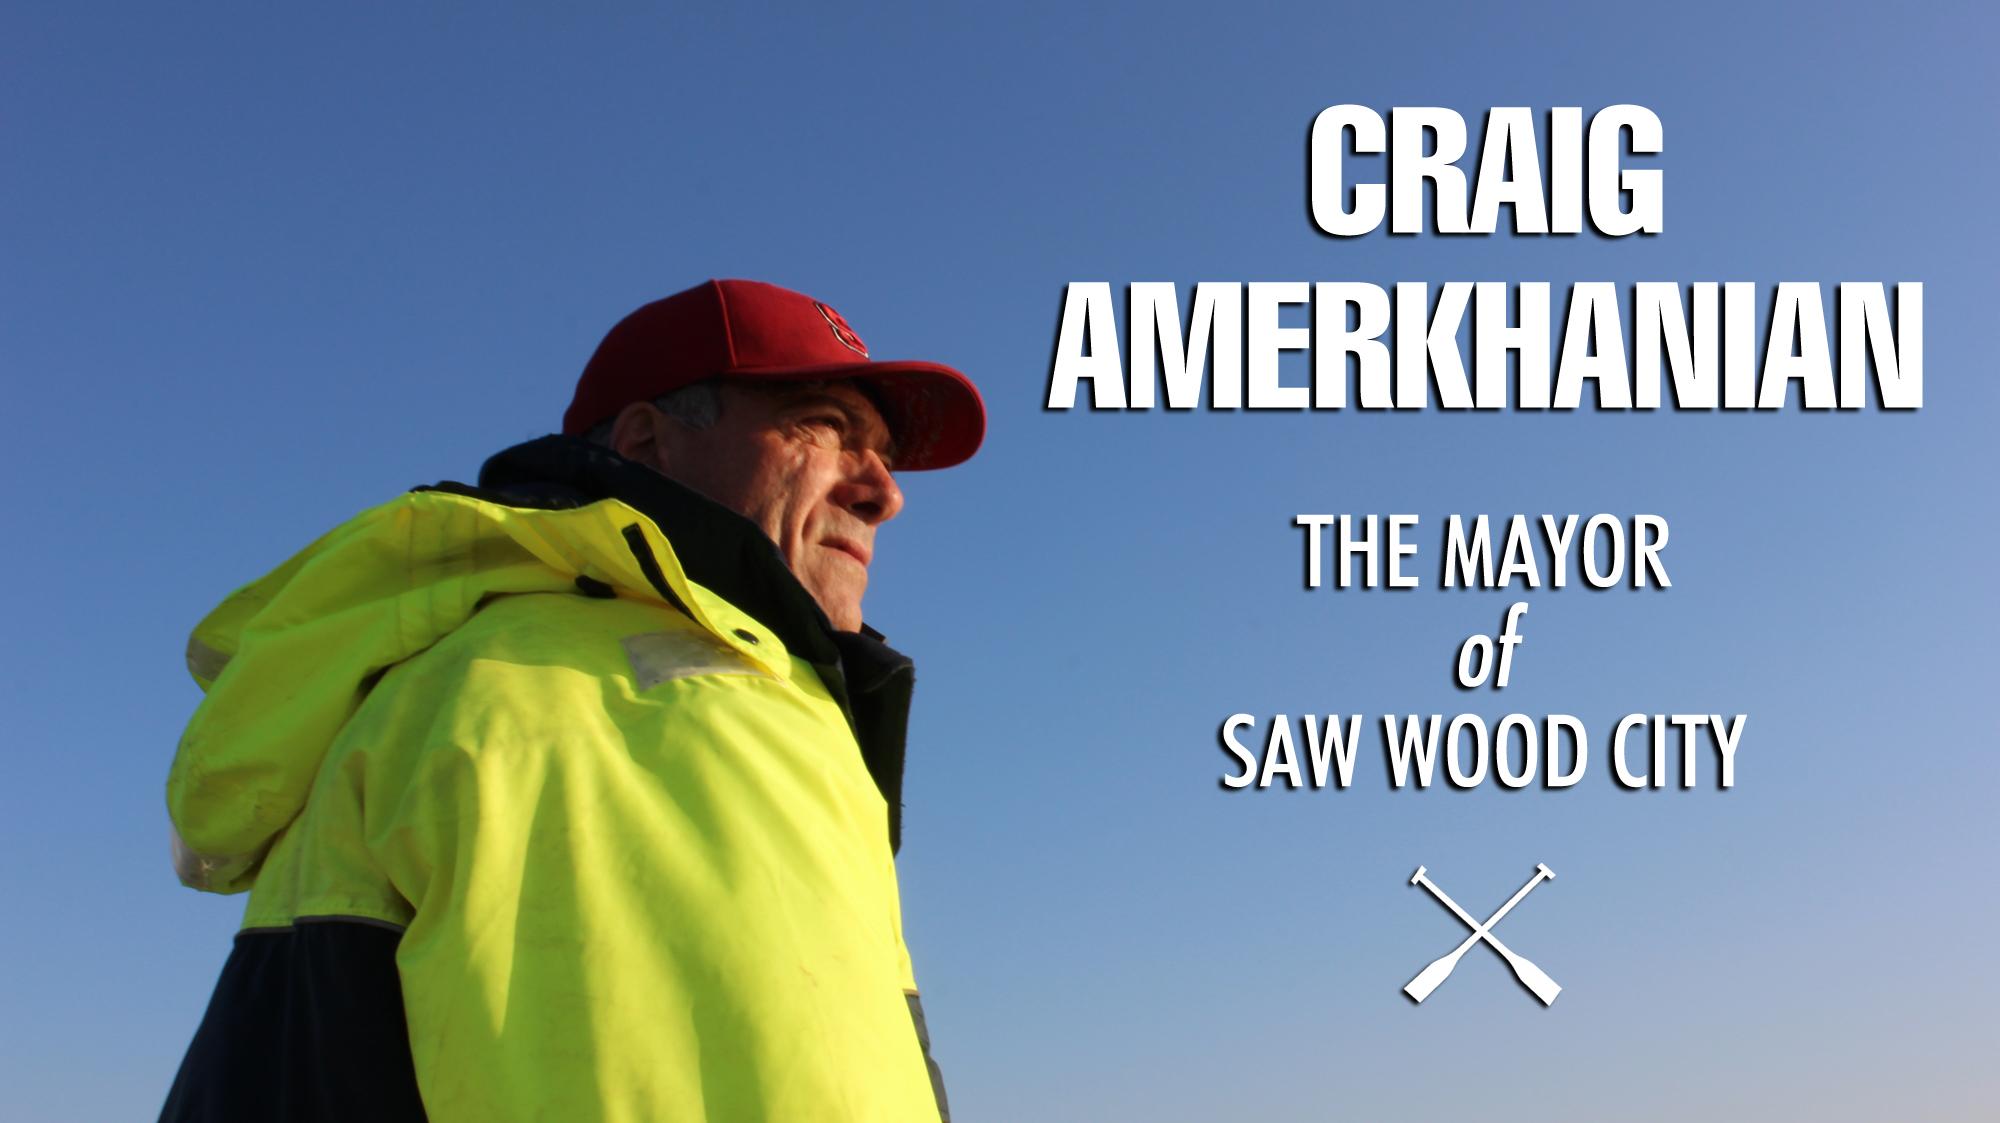 Craig Amerkhanian (JORDAN WALLACH/The Stanford Daily)